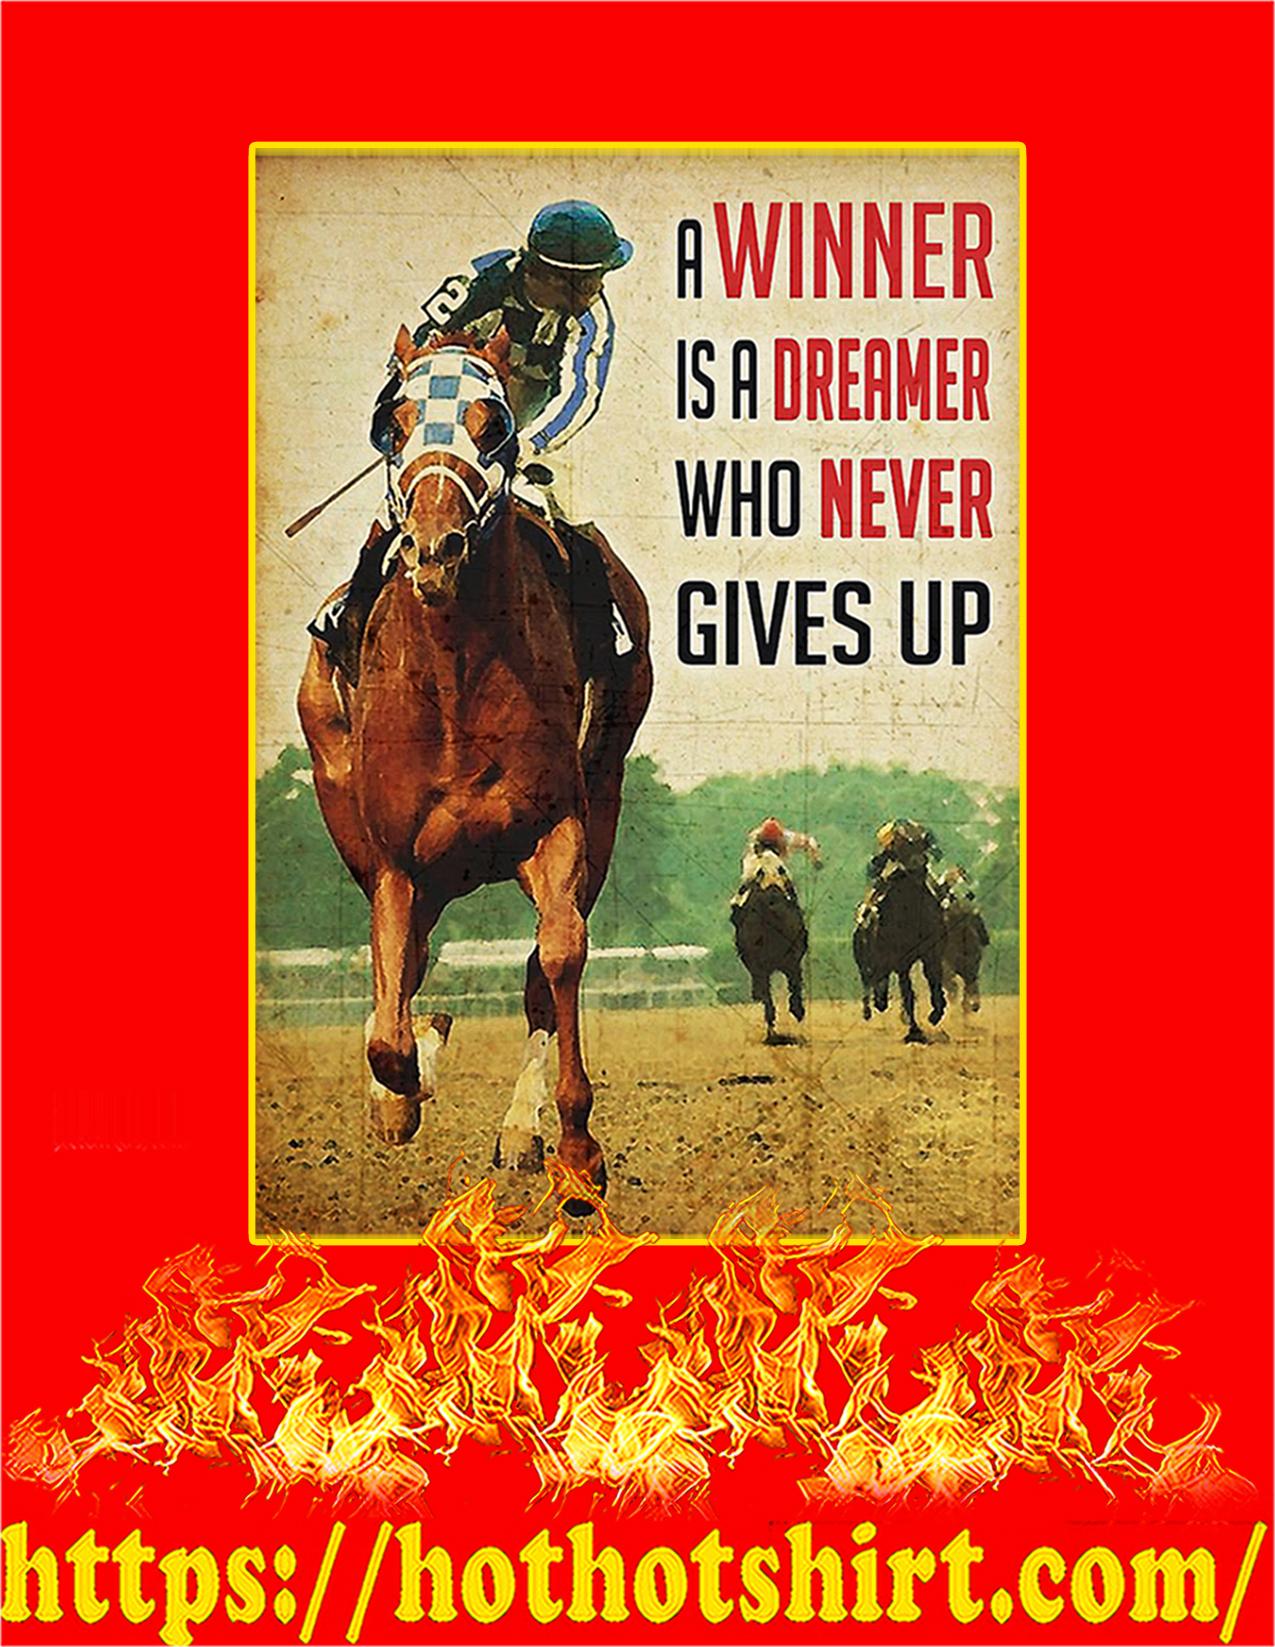 Horse racing A winner is a dreamer poster - A2